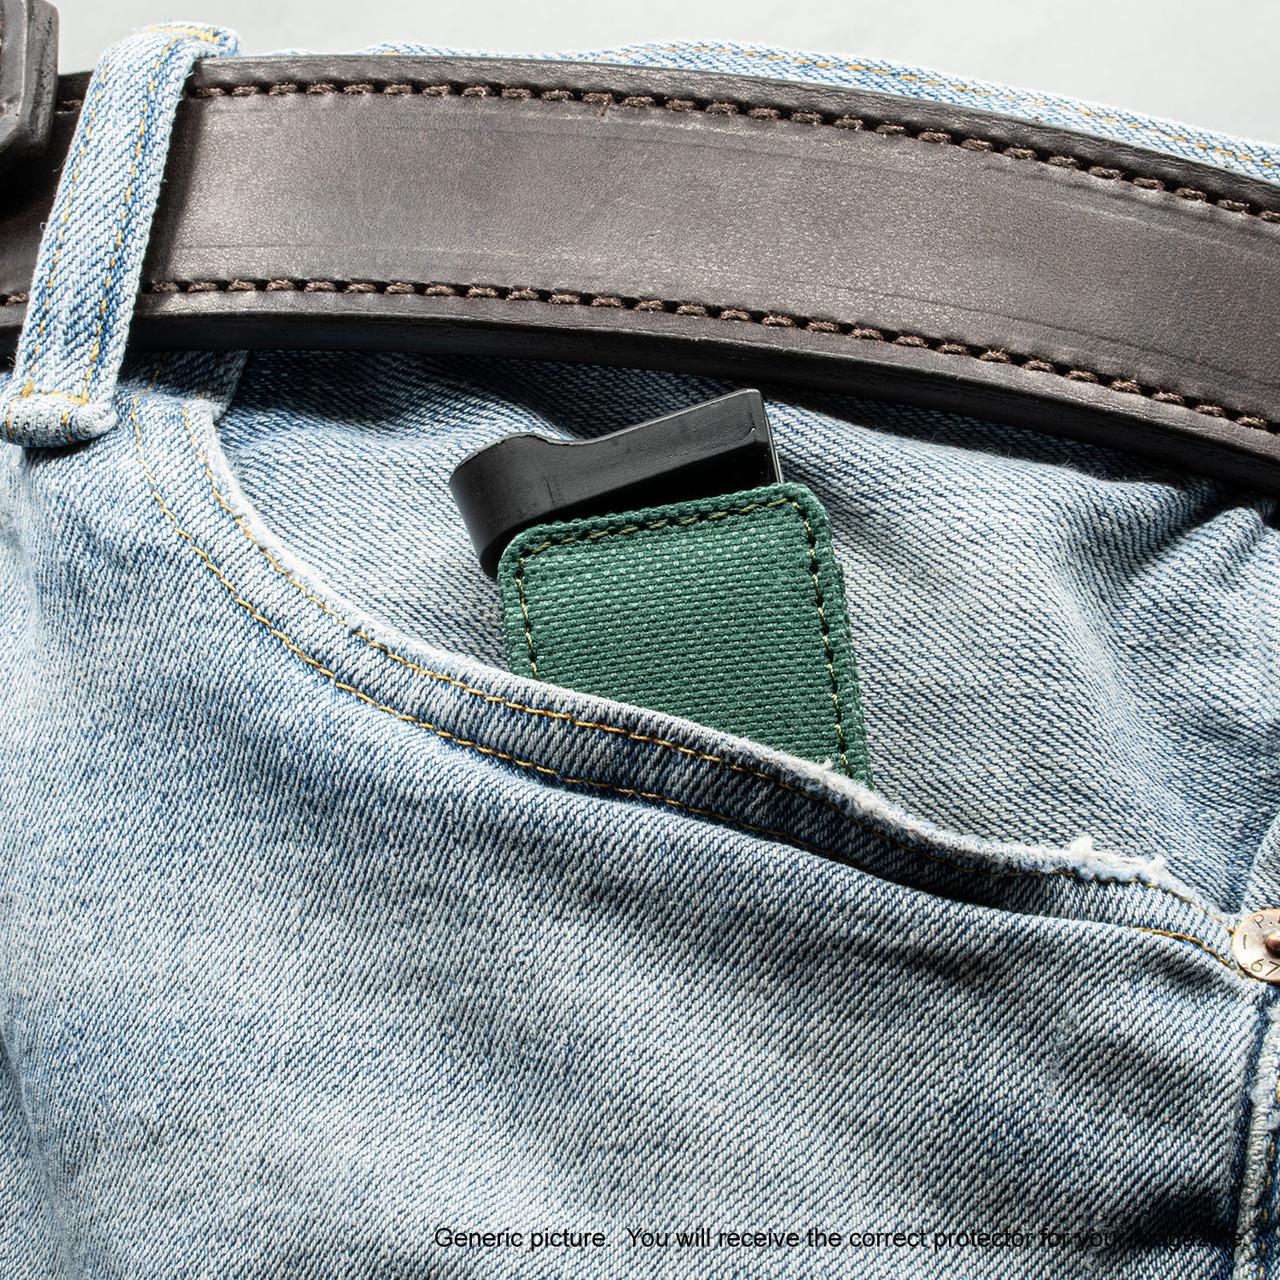 Remington R51 Green Covert Magazine Pocket Protector